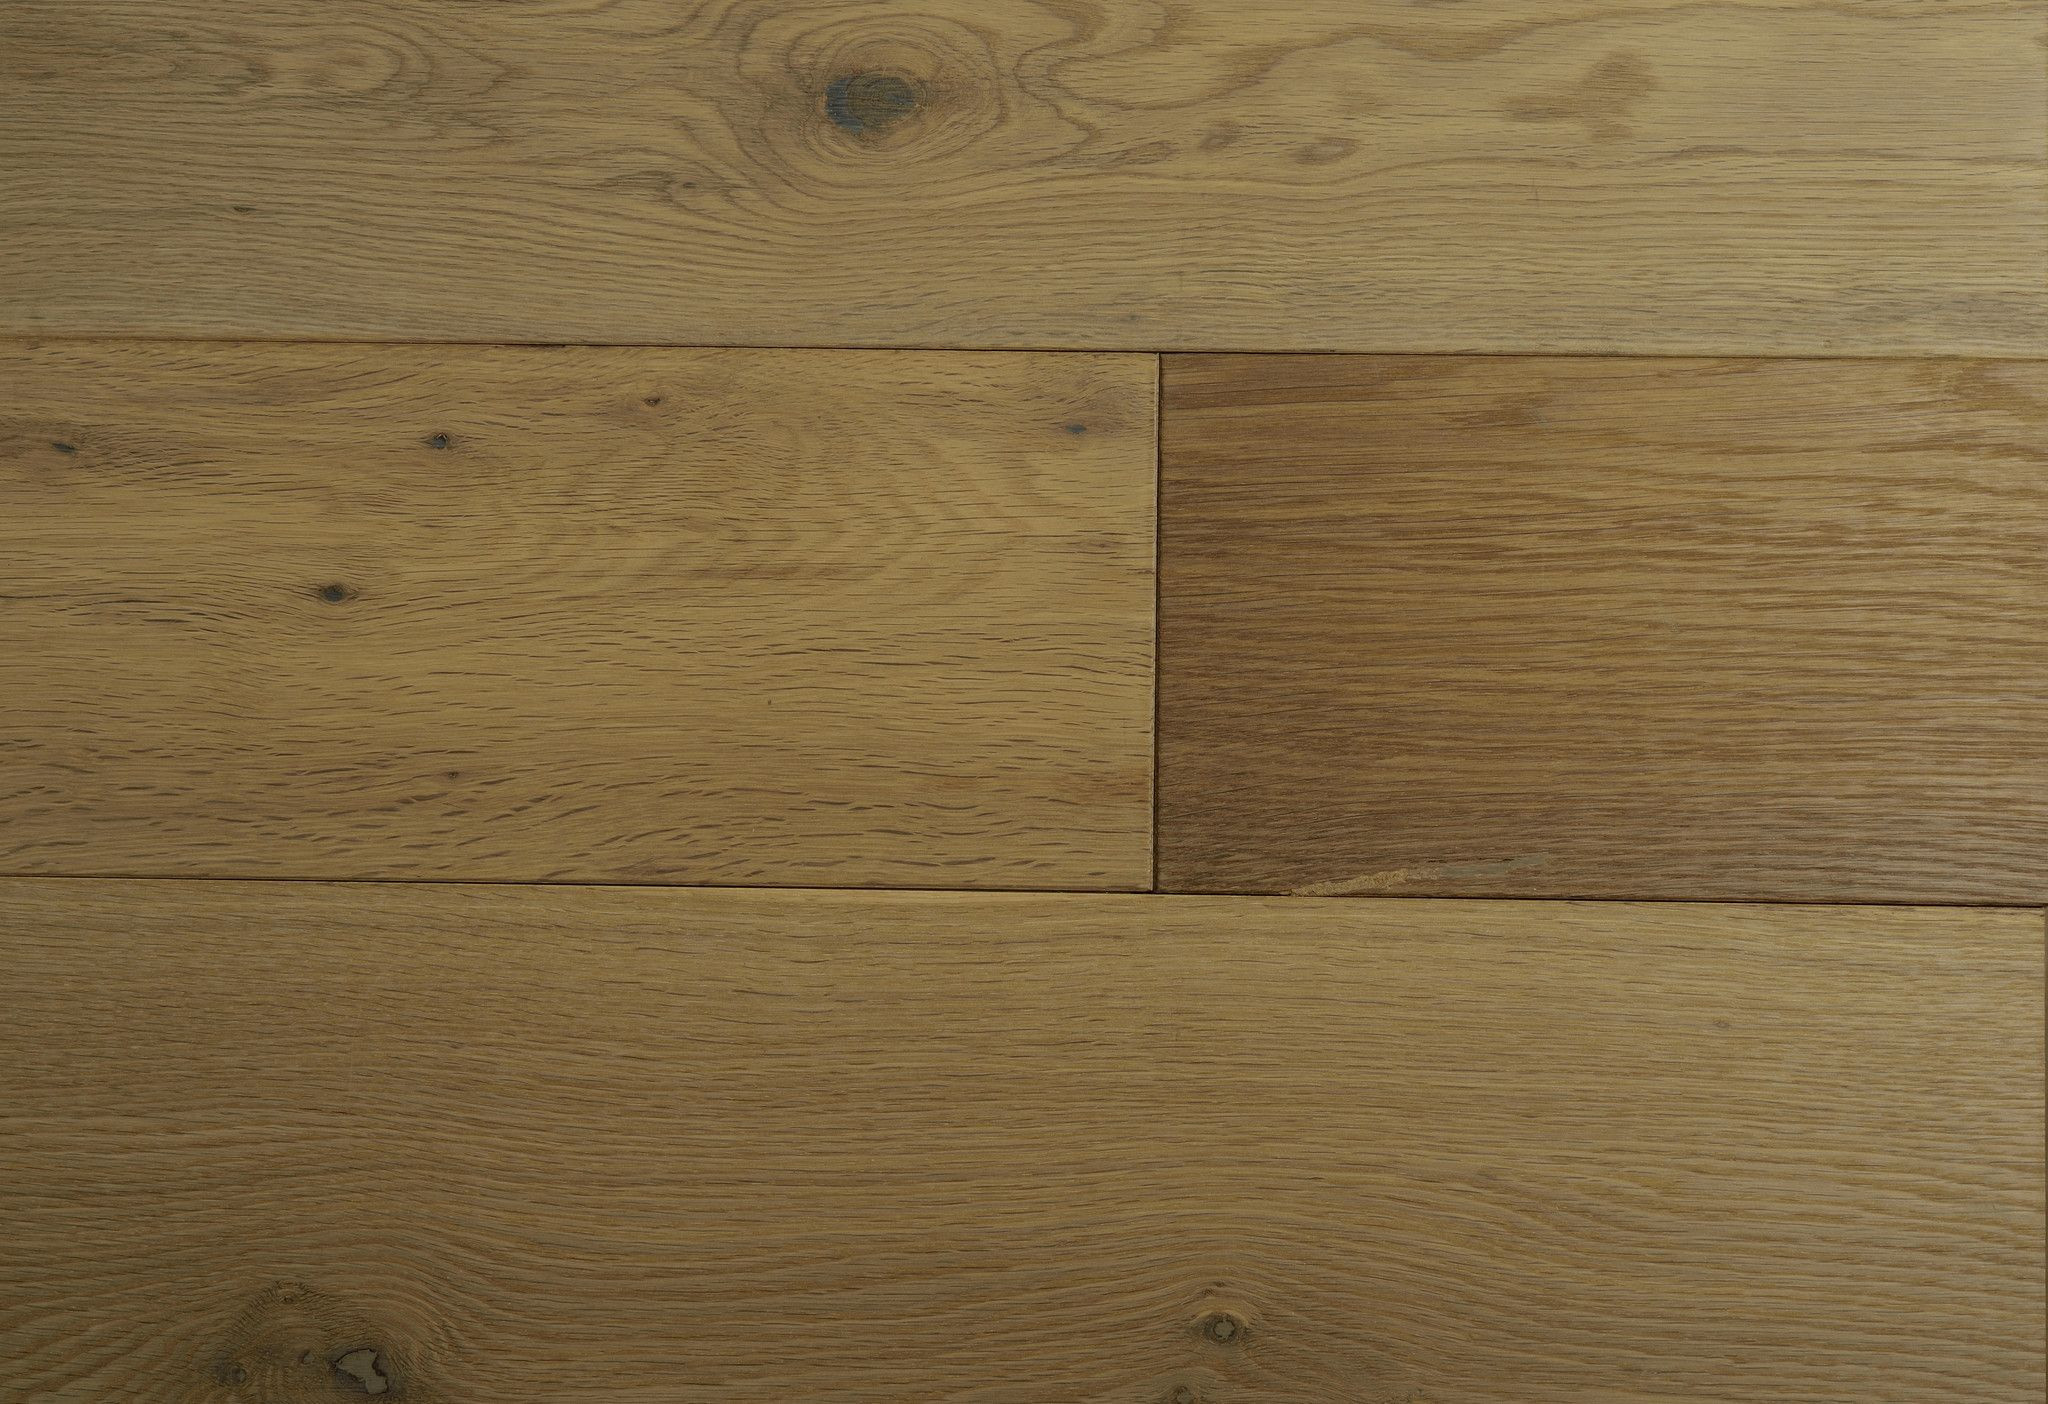 european oak hardwood floors of everbrite white oak smoked solid 3 4 white oak wax and products pertaining to everbrite white oak smoked solid 3 4 white oaksmokingfloors randomoilproductsflooringsmockingtobacco smoking